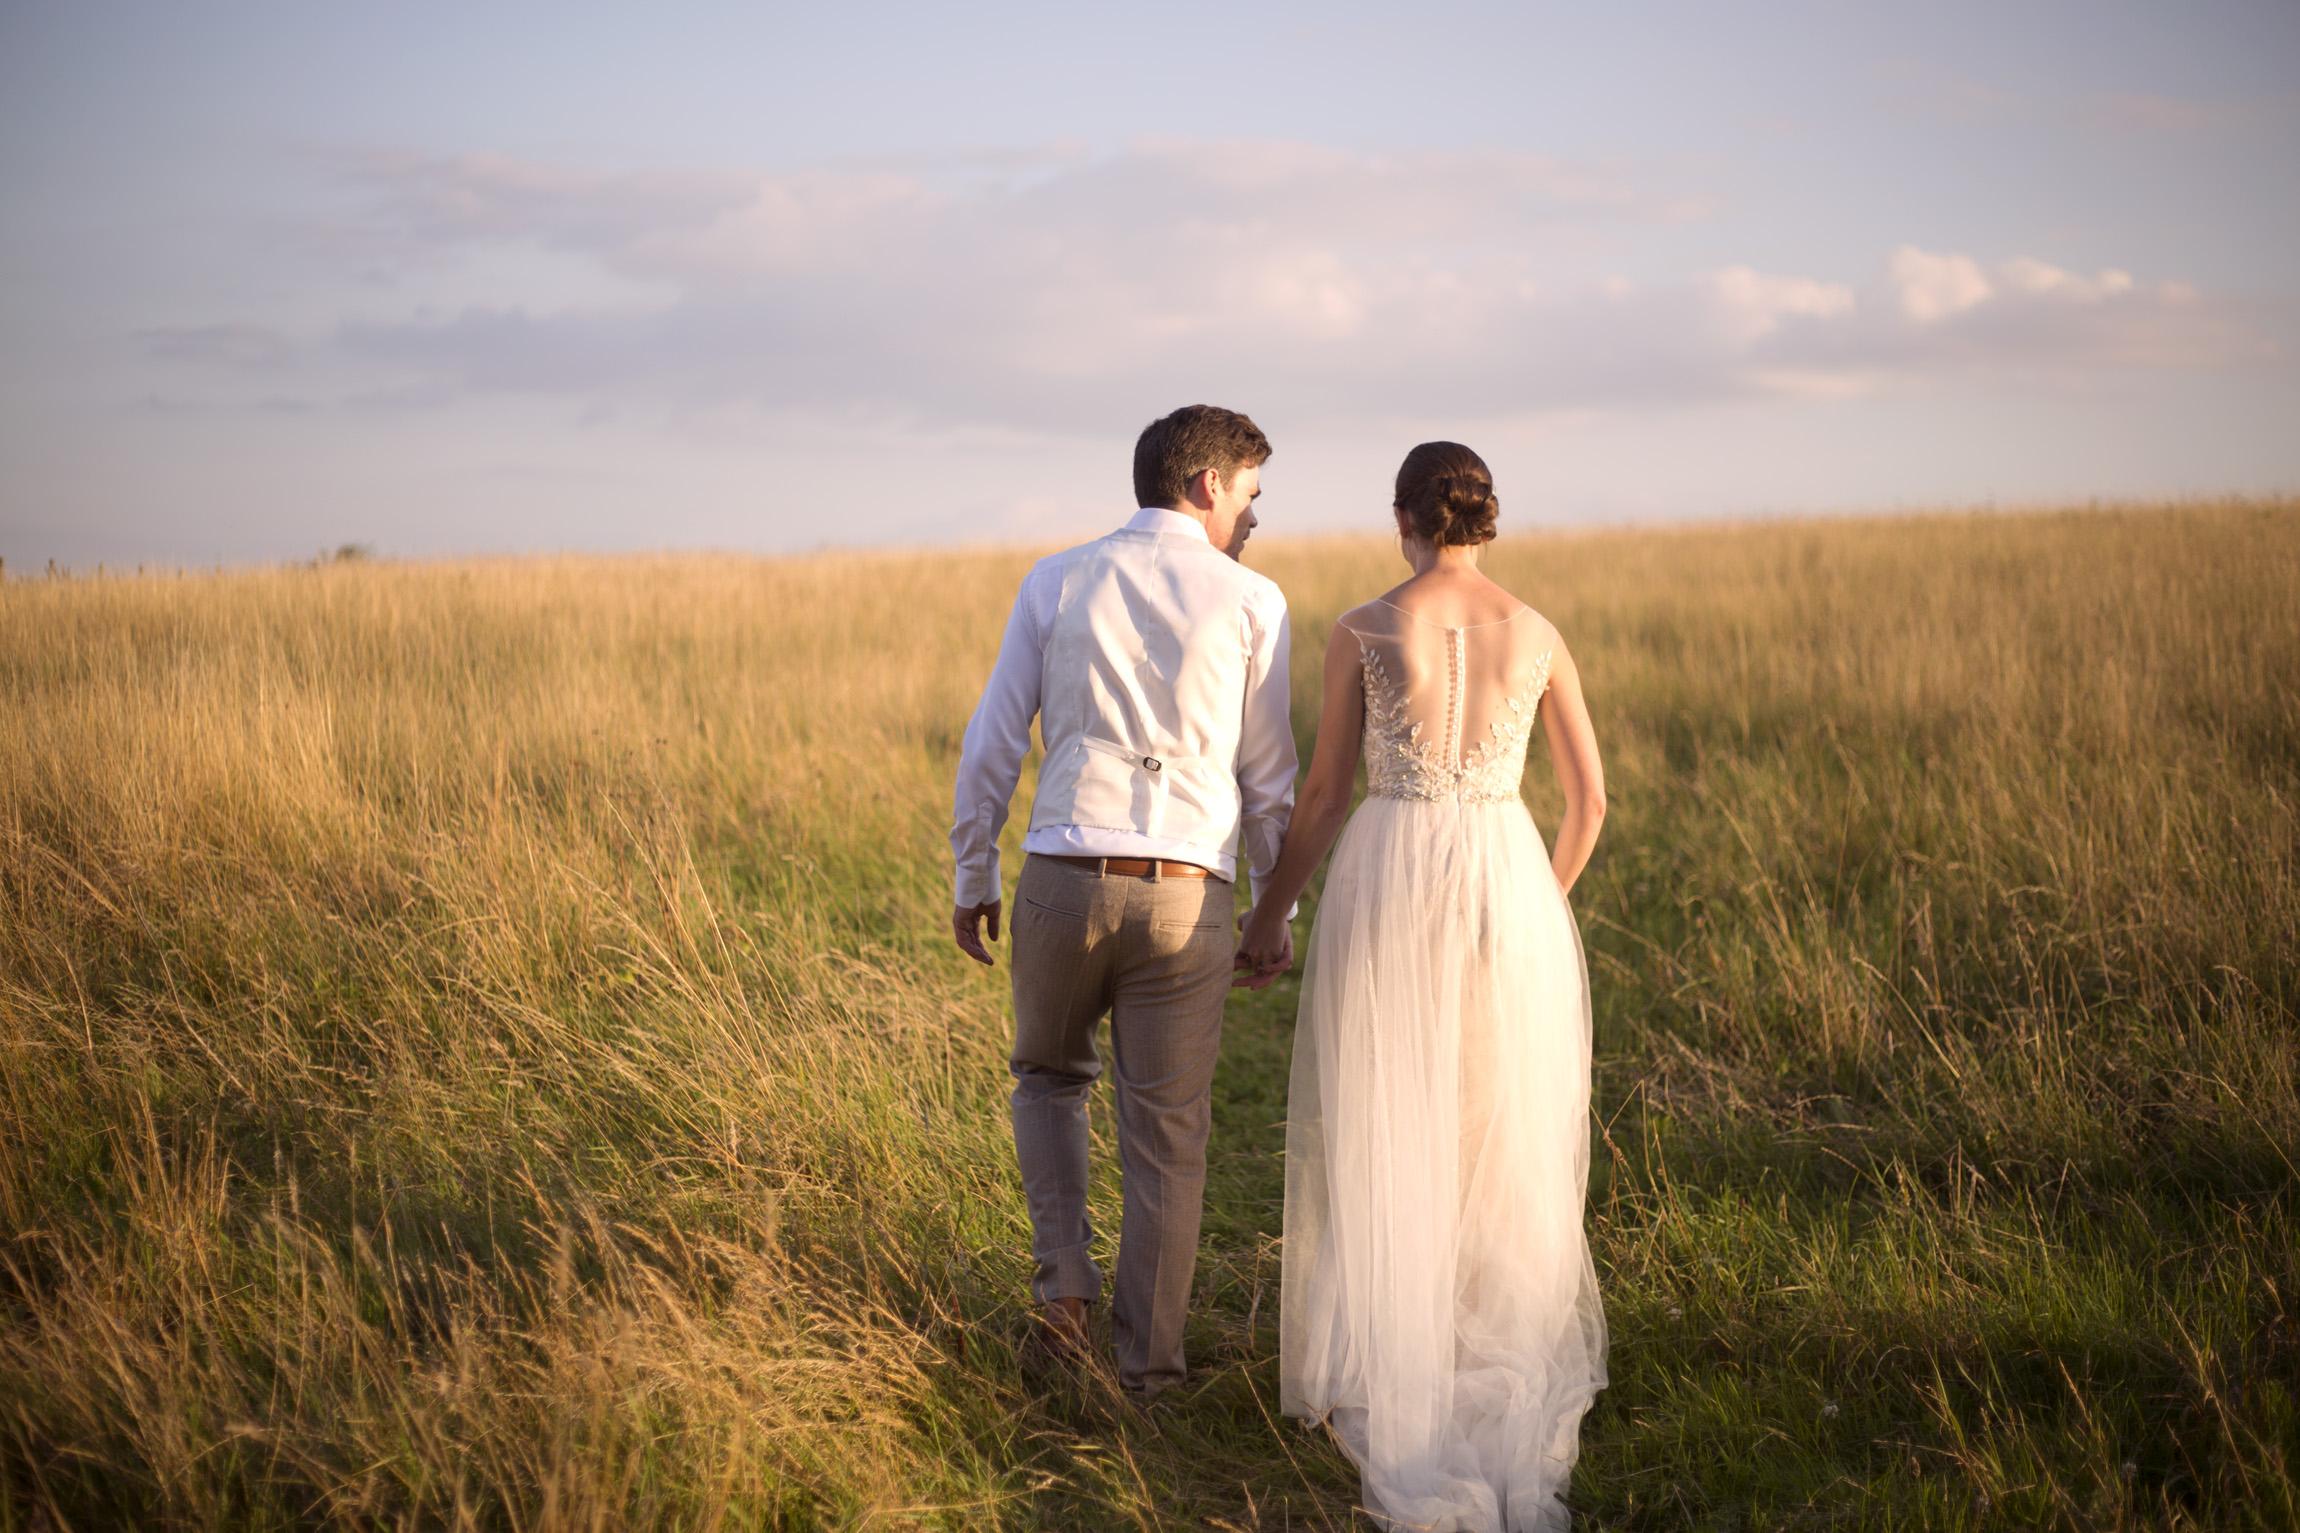 Bride and groom holding hands sunset golden hour Cripps barn outdoor wedding photographer